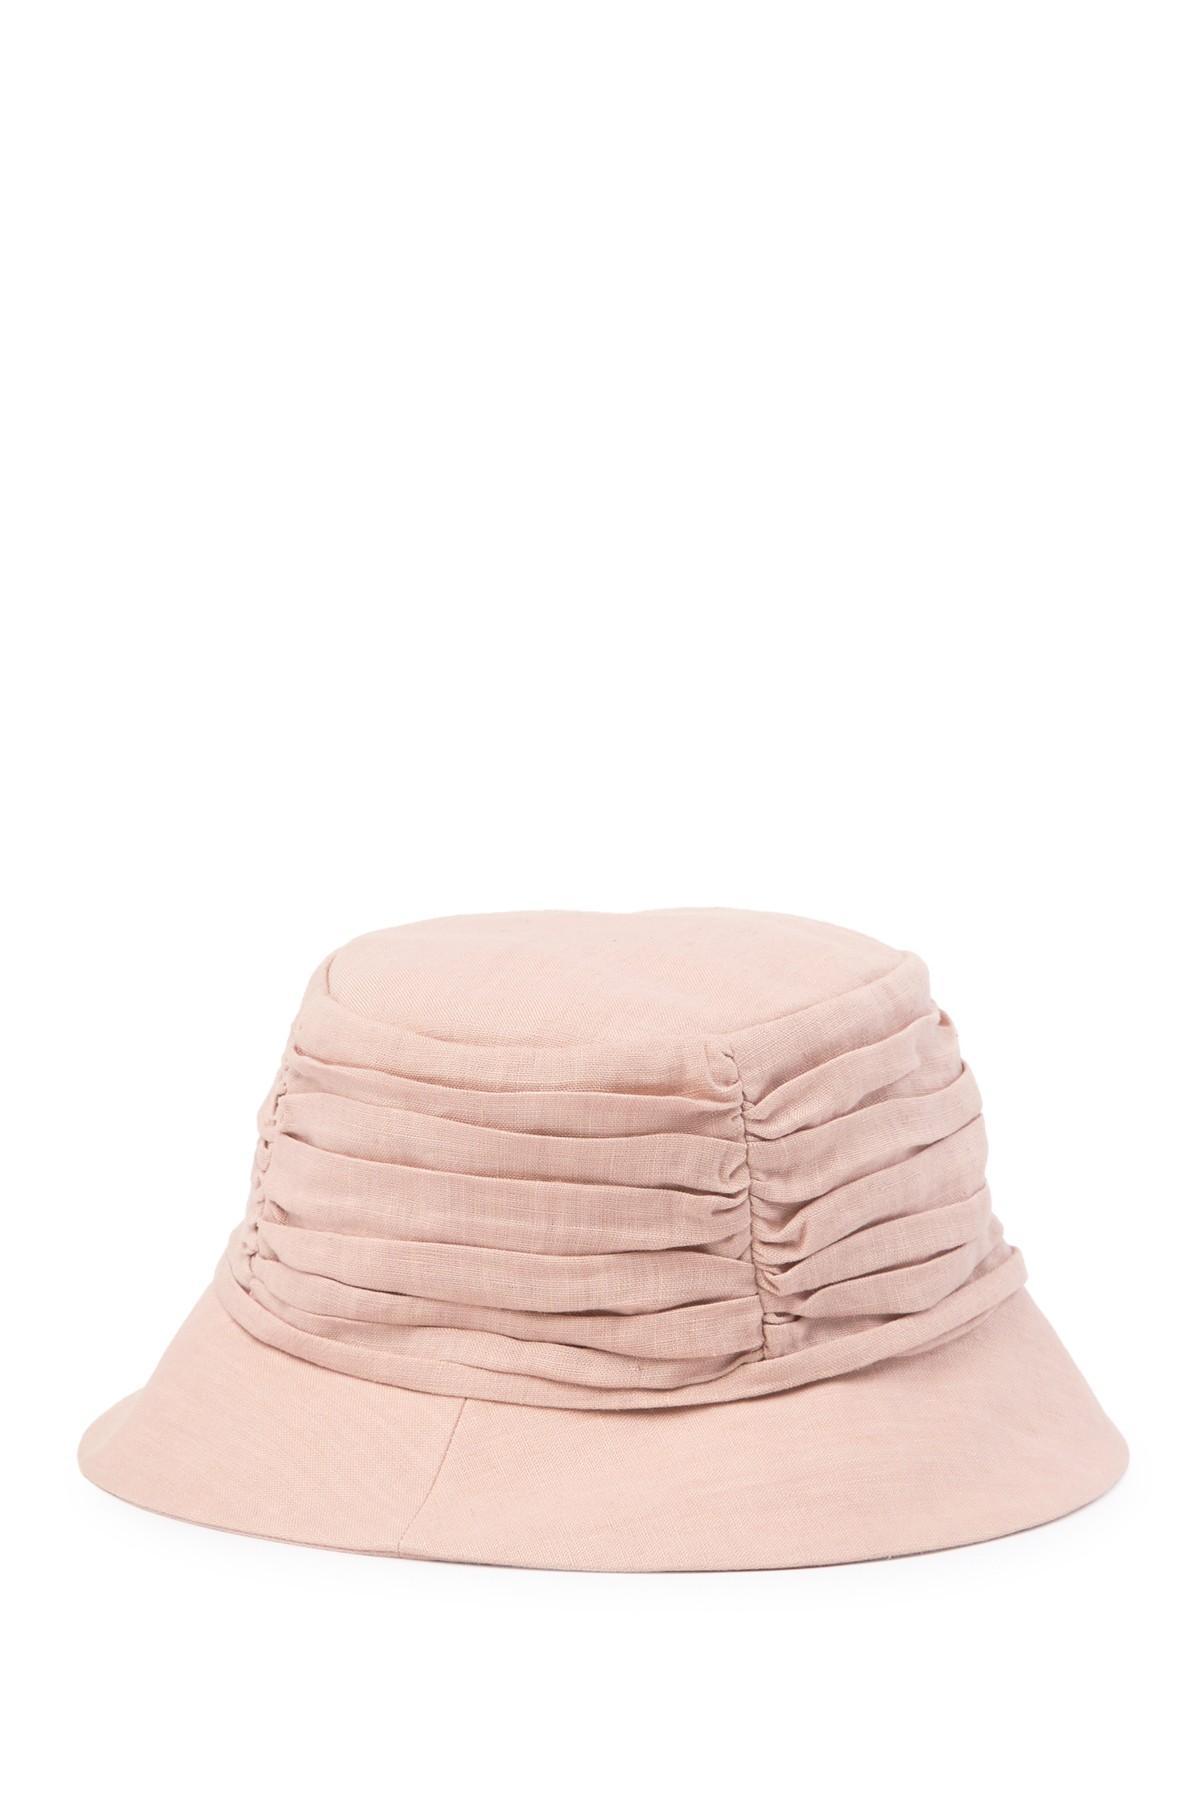 Helen Kaminski - Pink Raylyn Gathered Bucket Hat - Lyst. View fullscreen 2c7b1b1f3e70